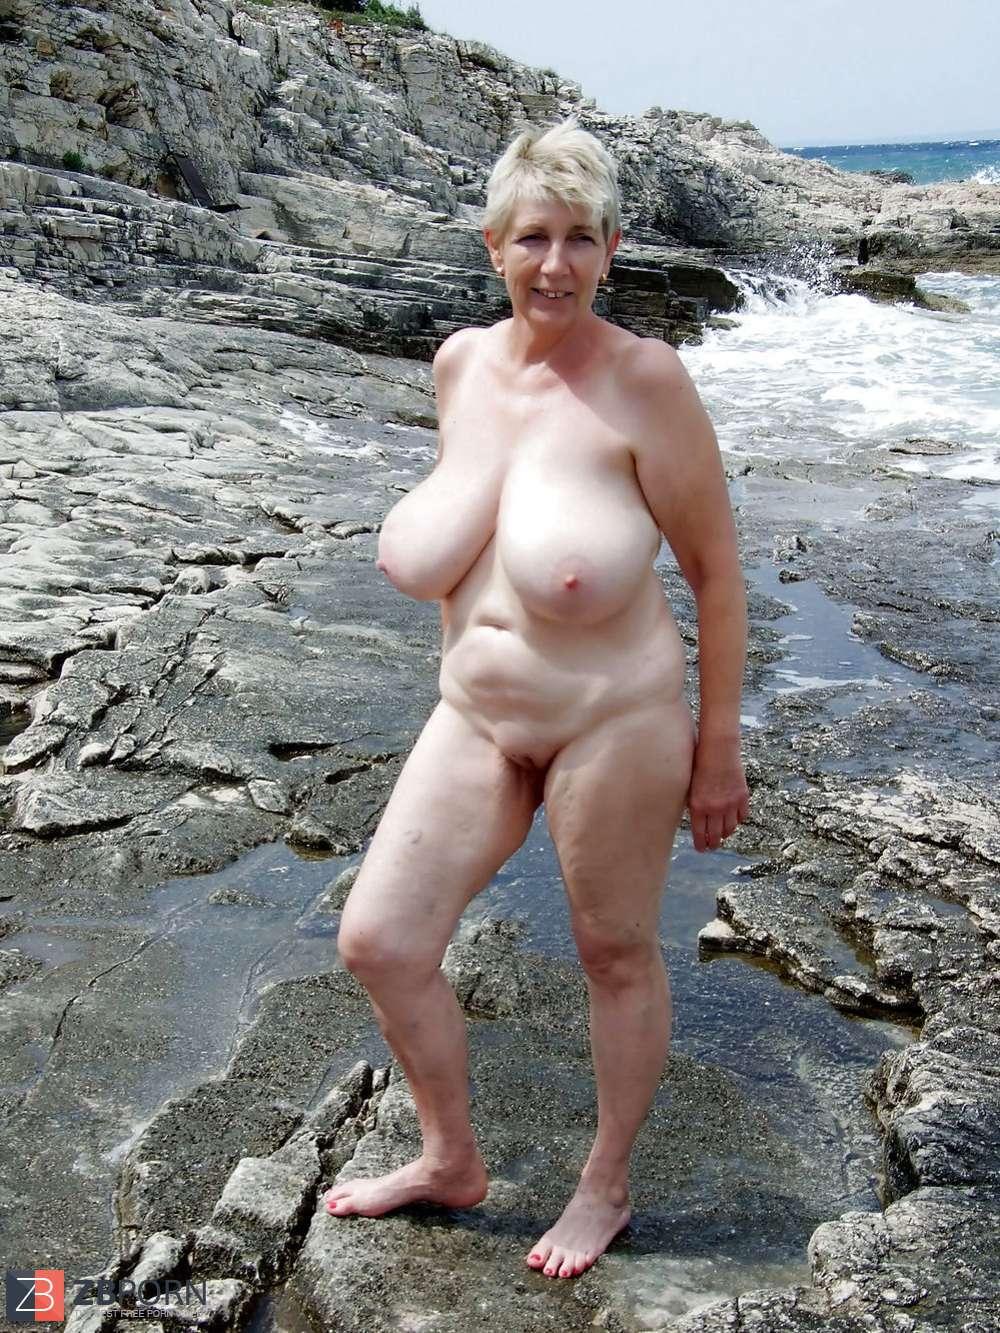 Naturist Granny Mega-Bitch  Zb Porn-7027